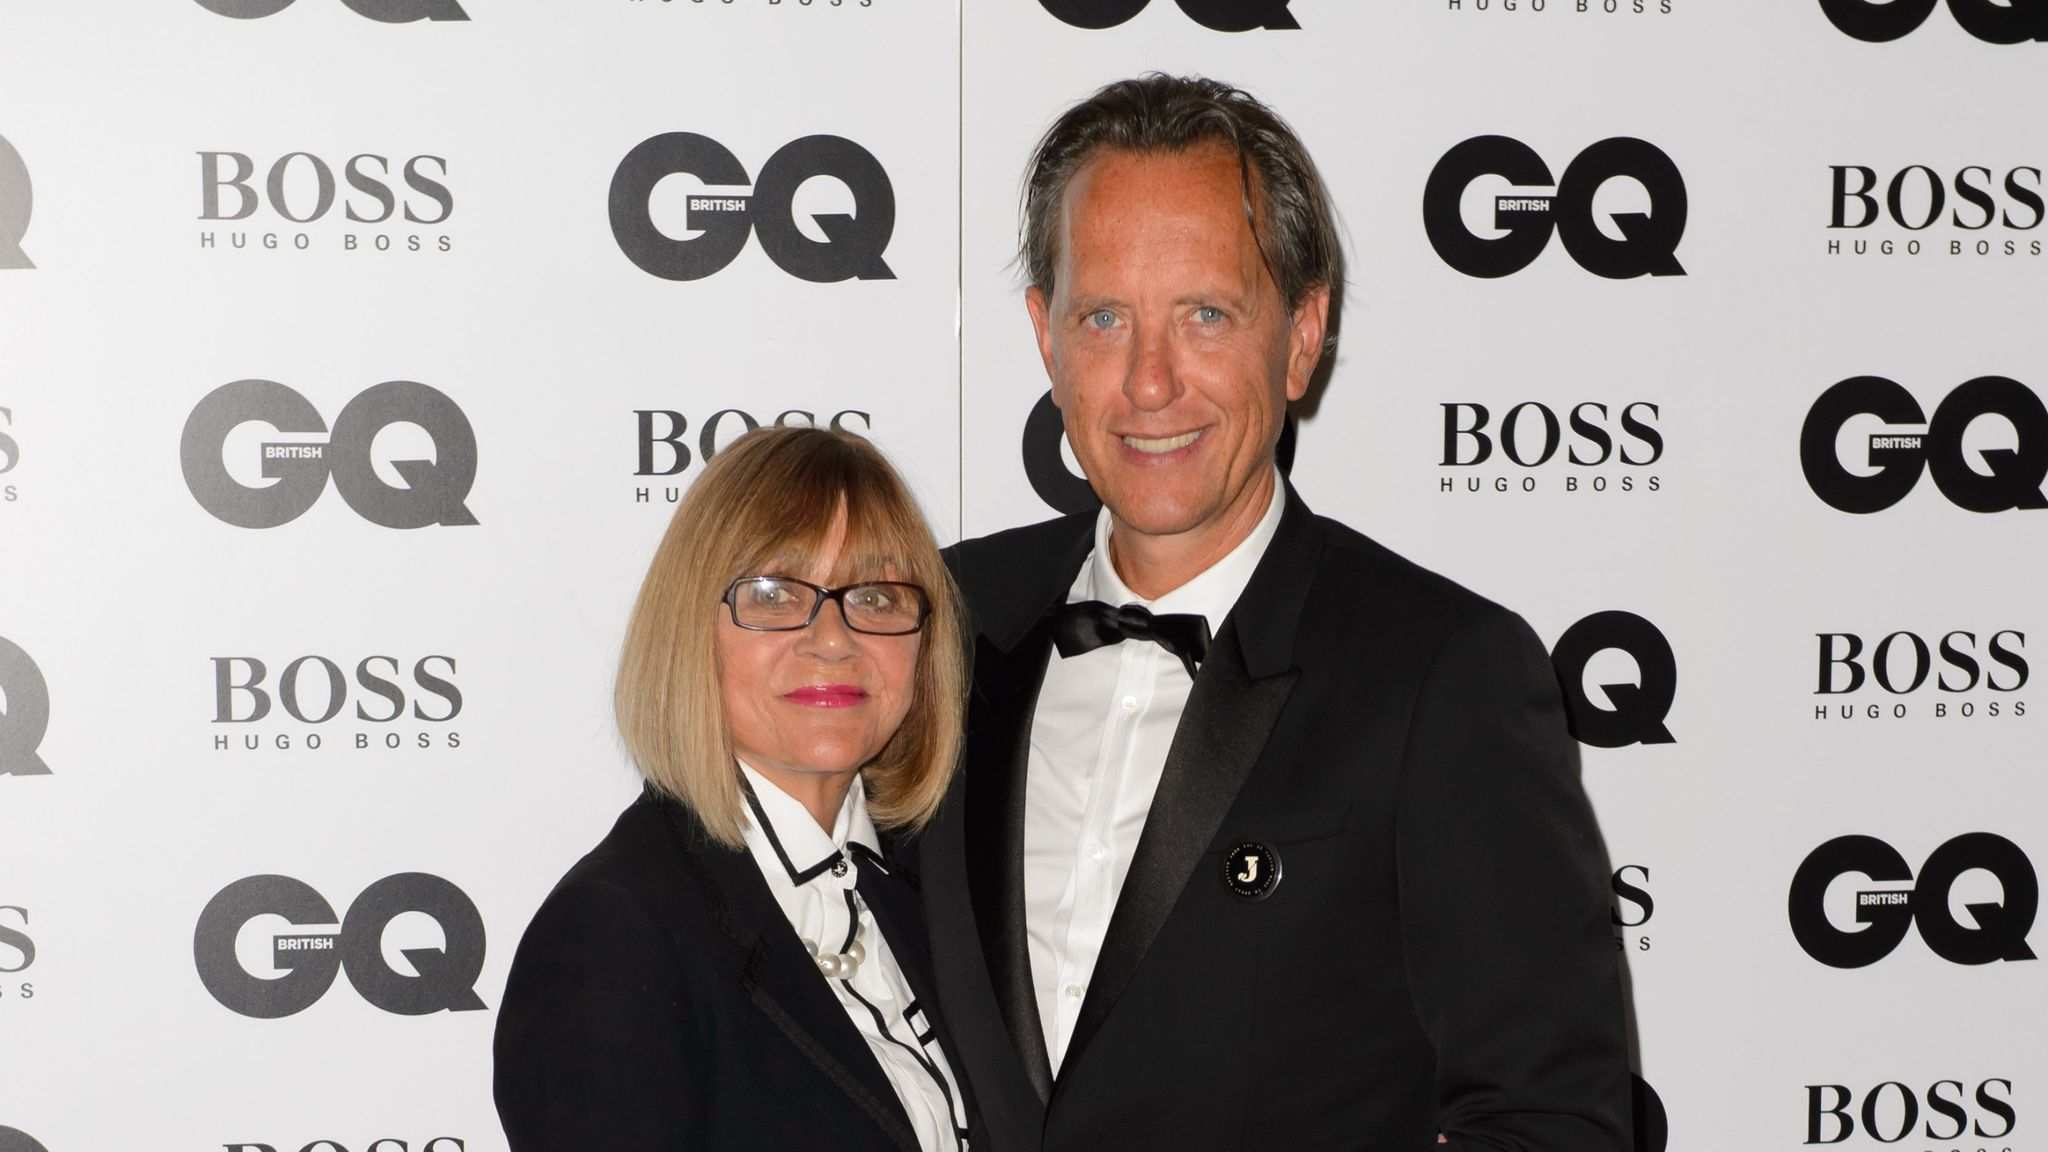 richard-e-grant-unveils-heart-breaking-news-his-wife-joan-washington-passed-away